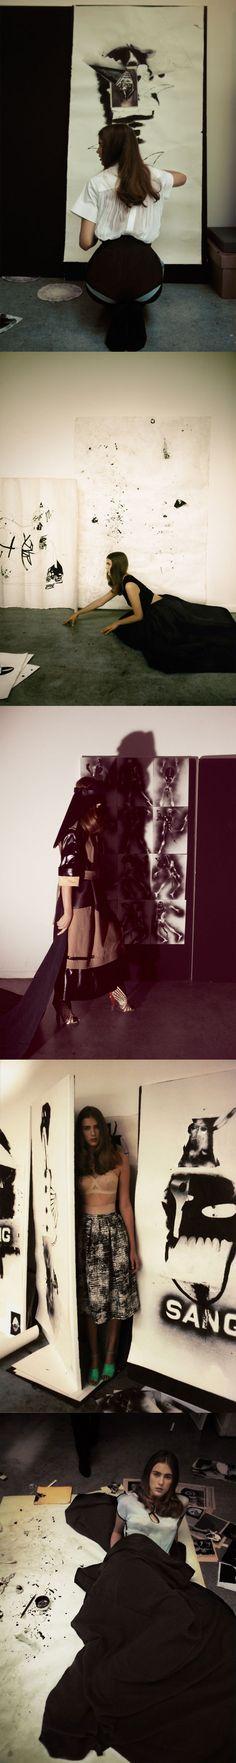 Styled by Camille Bidault-Waddington